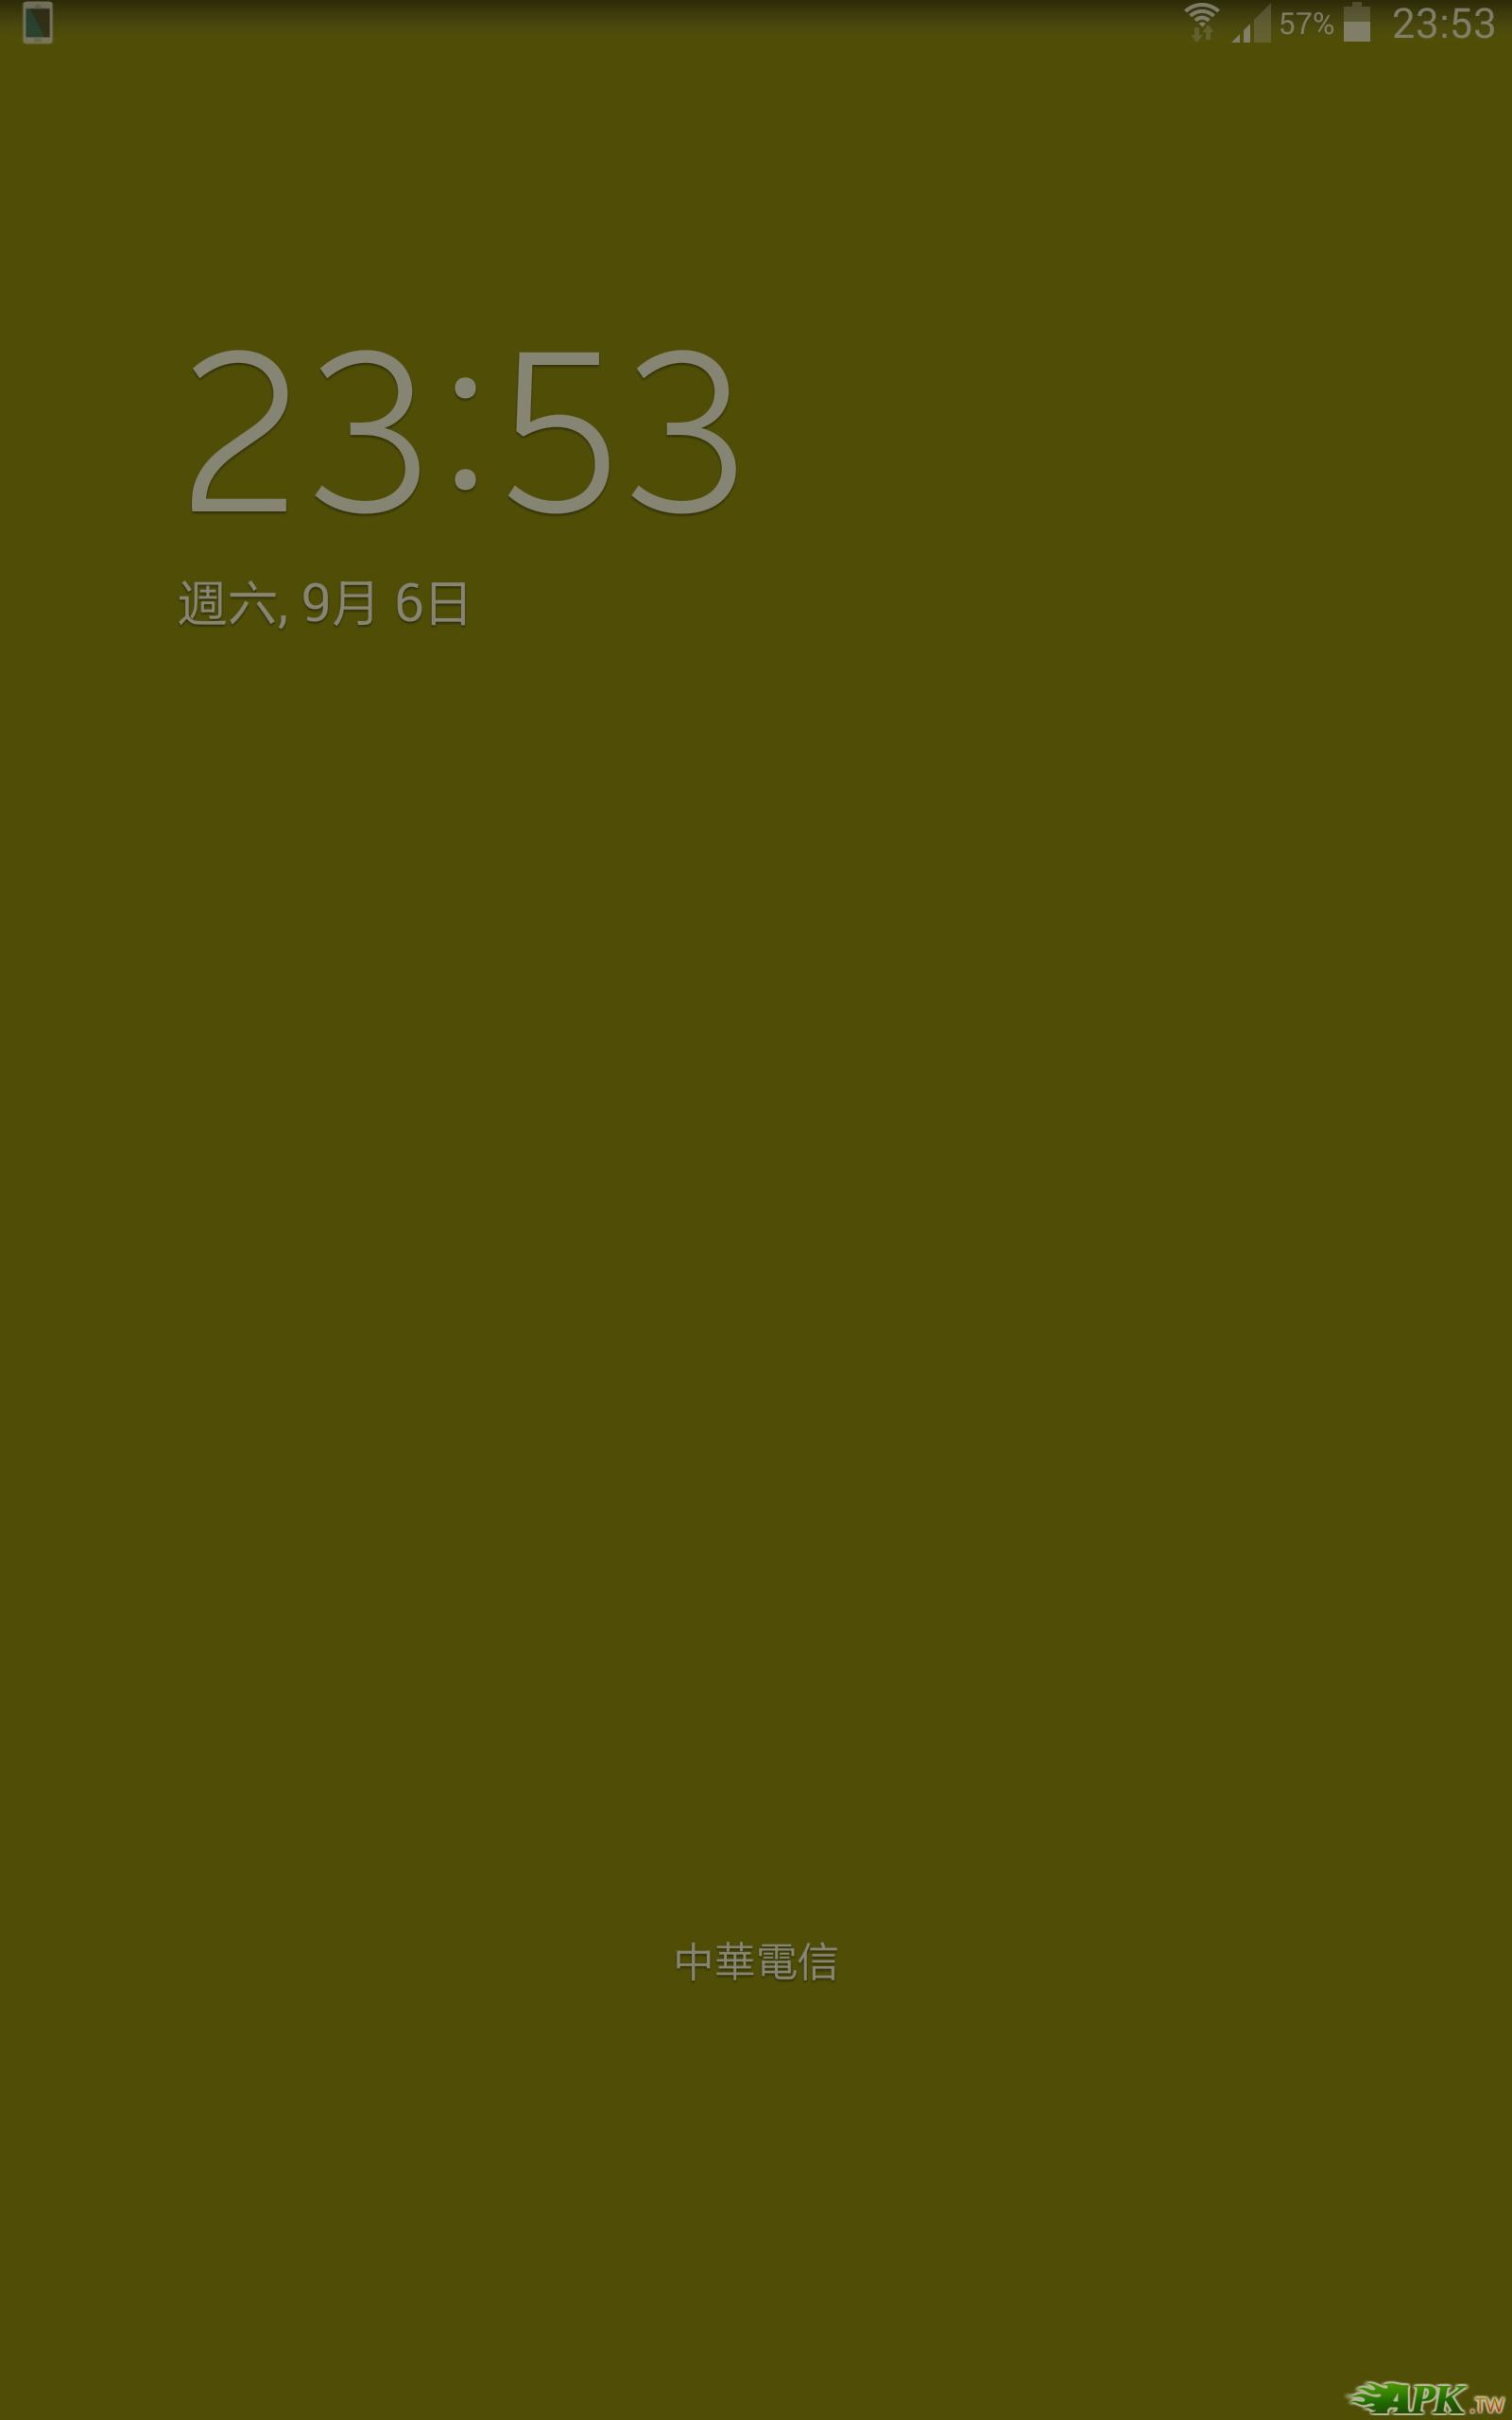 Screenshot_2014-09-06-23-53-02.png